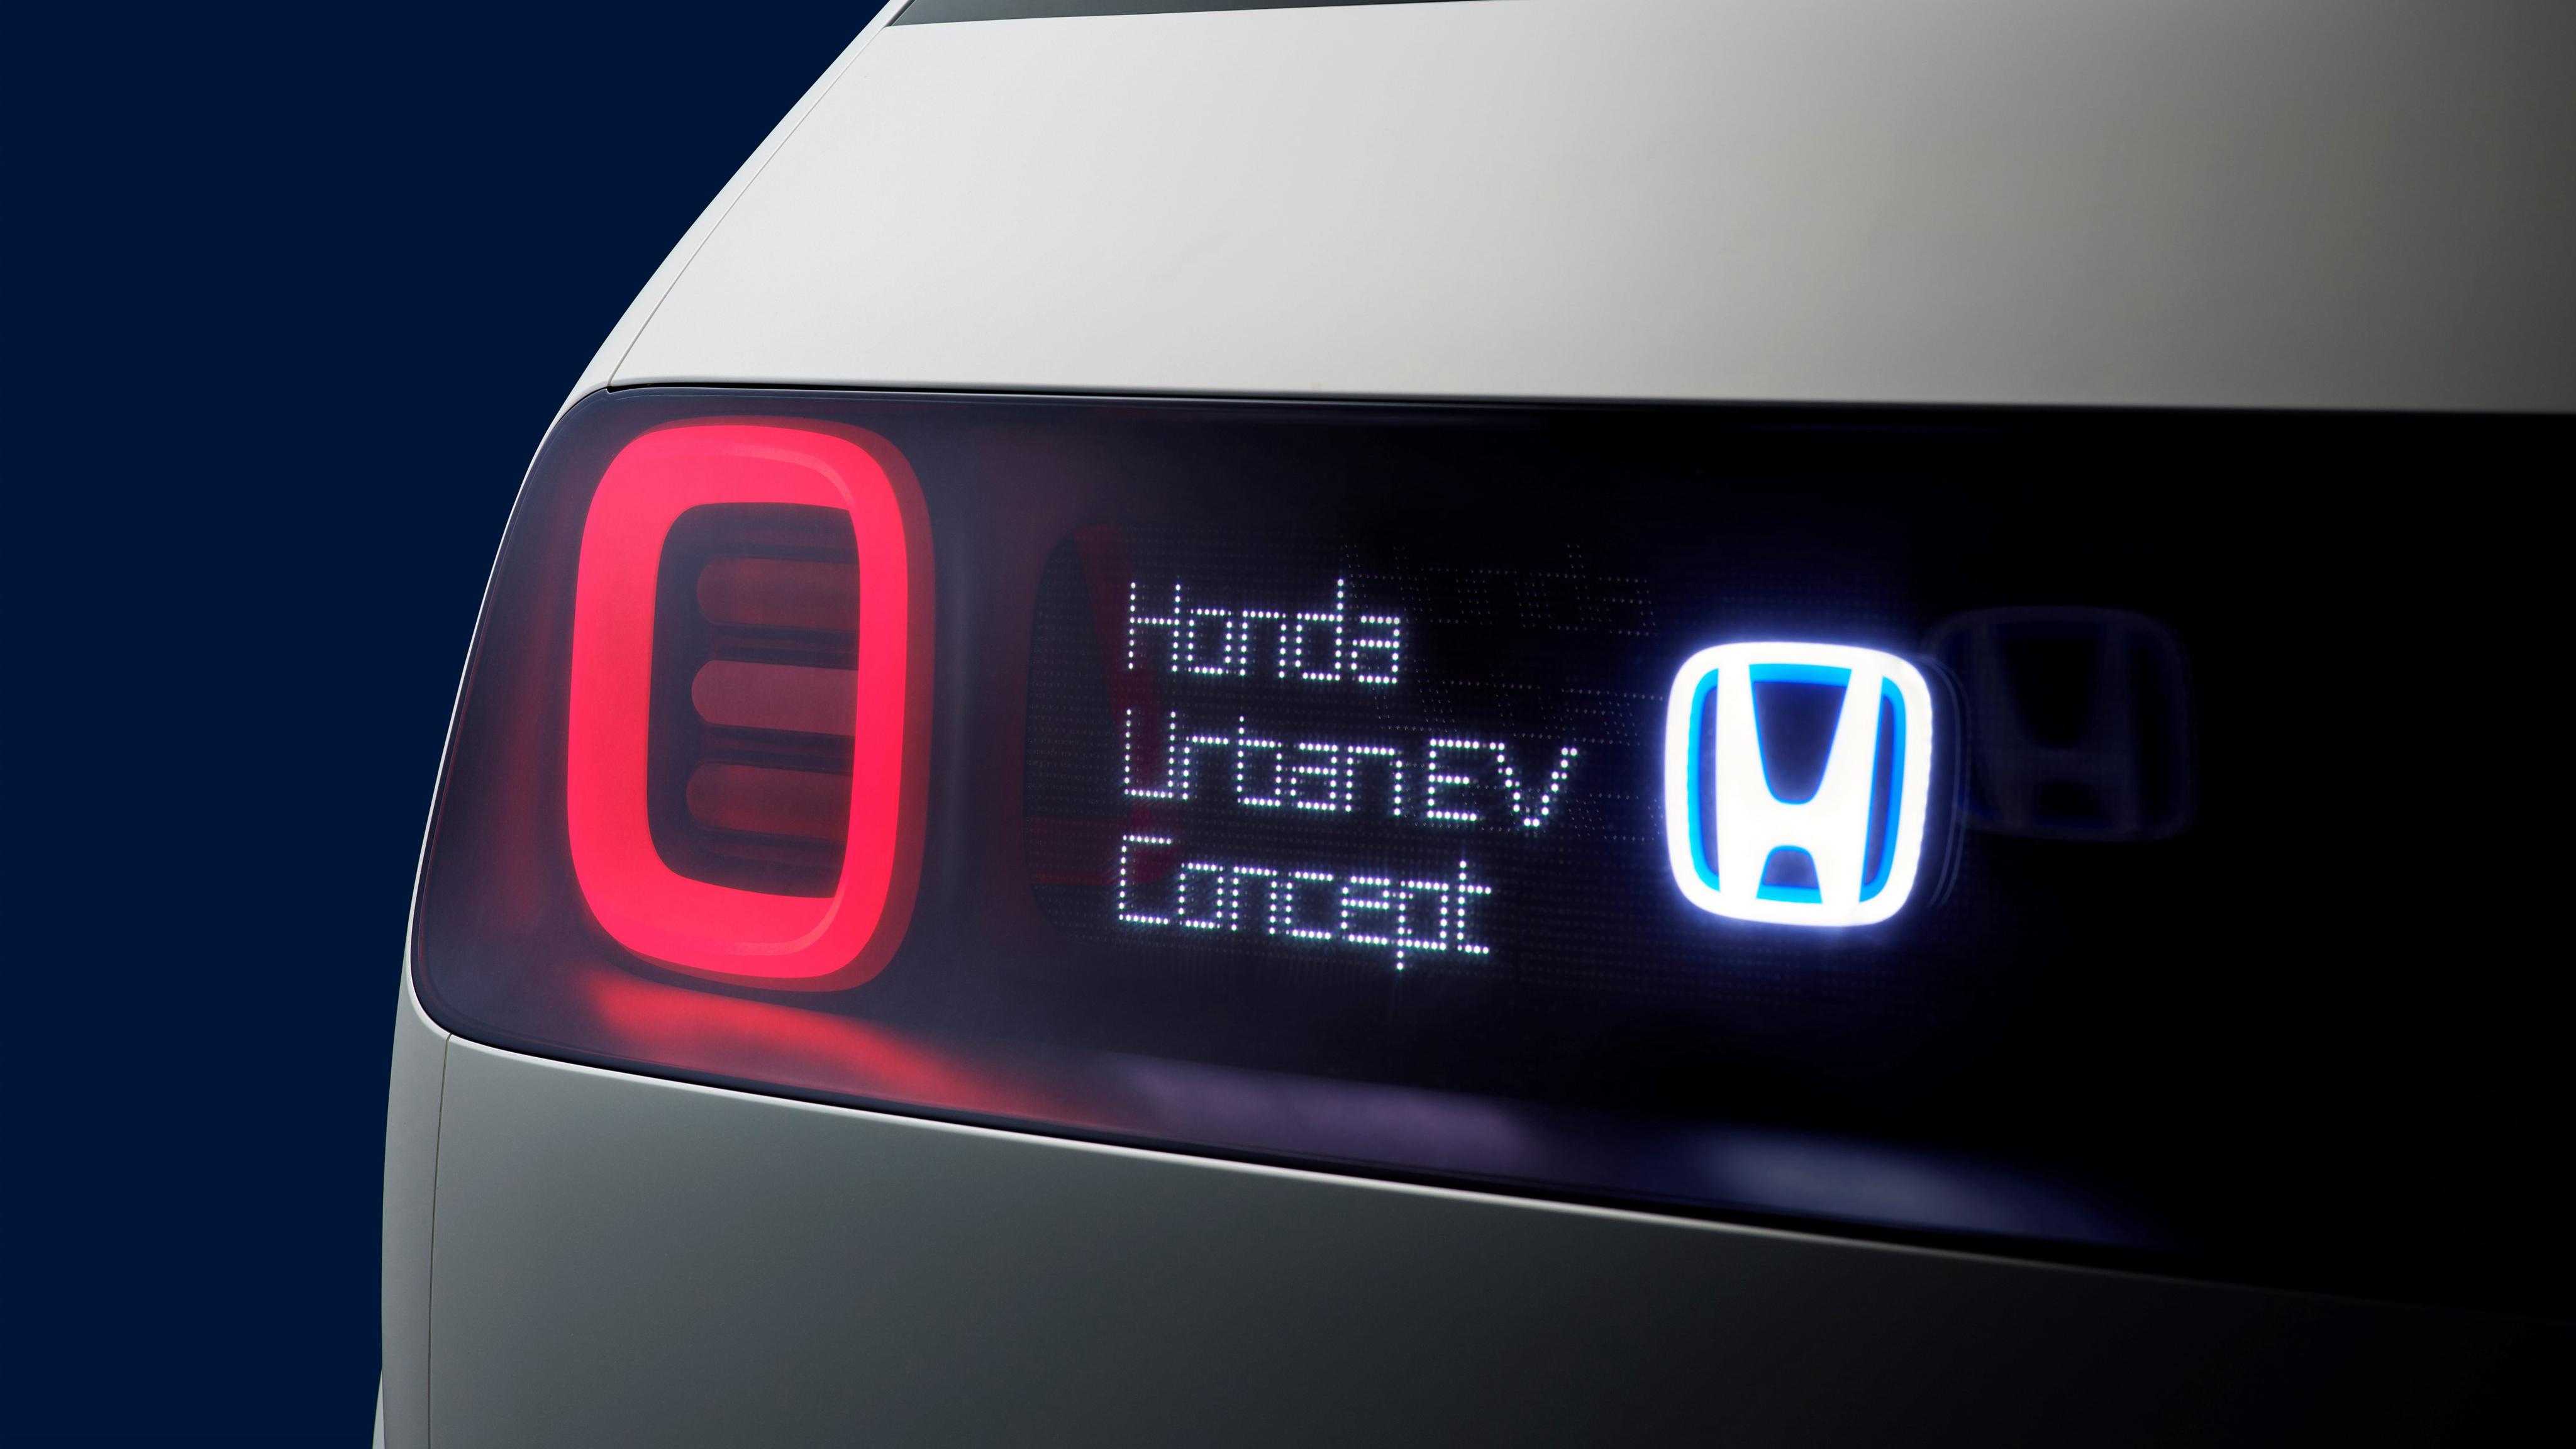 Honda Urban EV Concept 2017 International Motor Show 4K 2